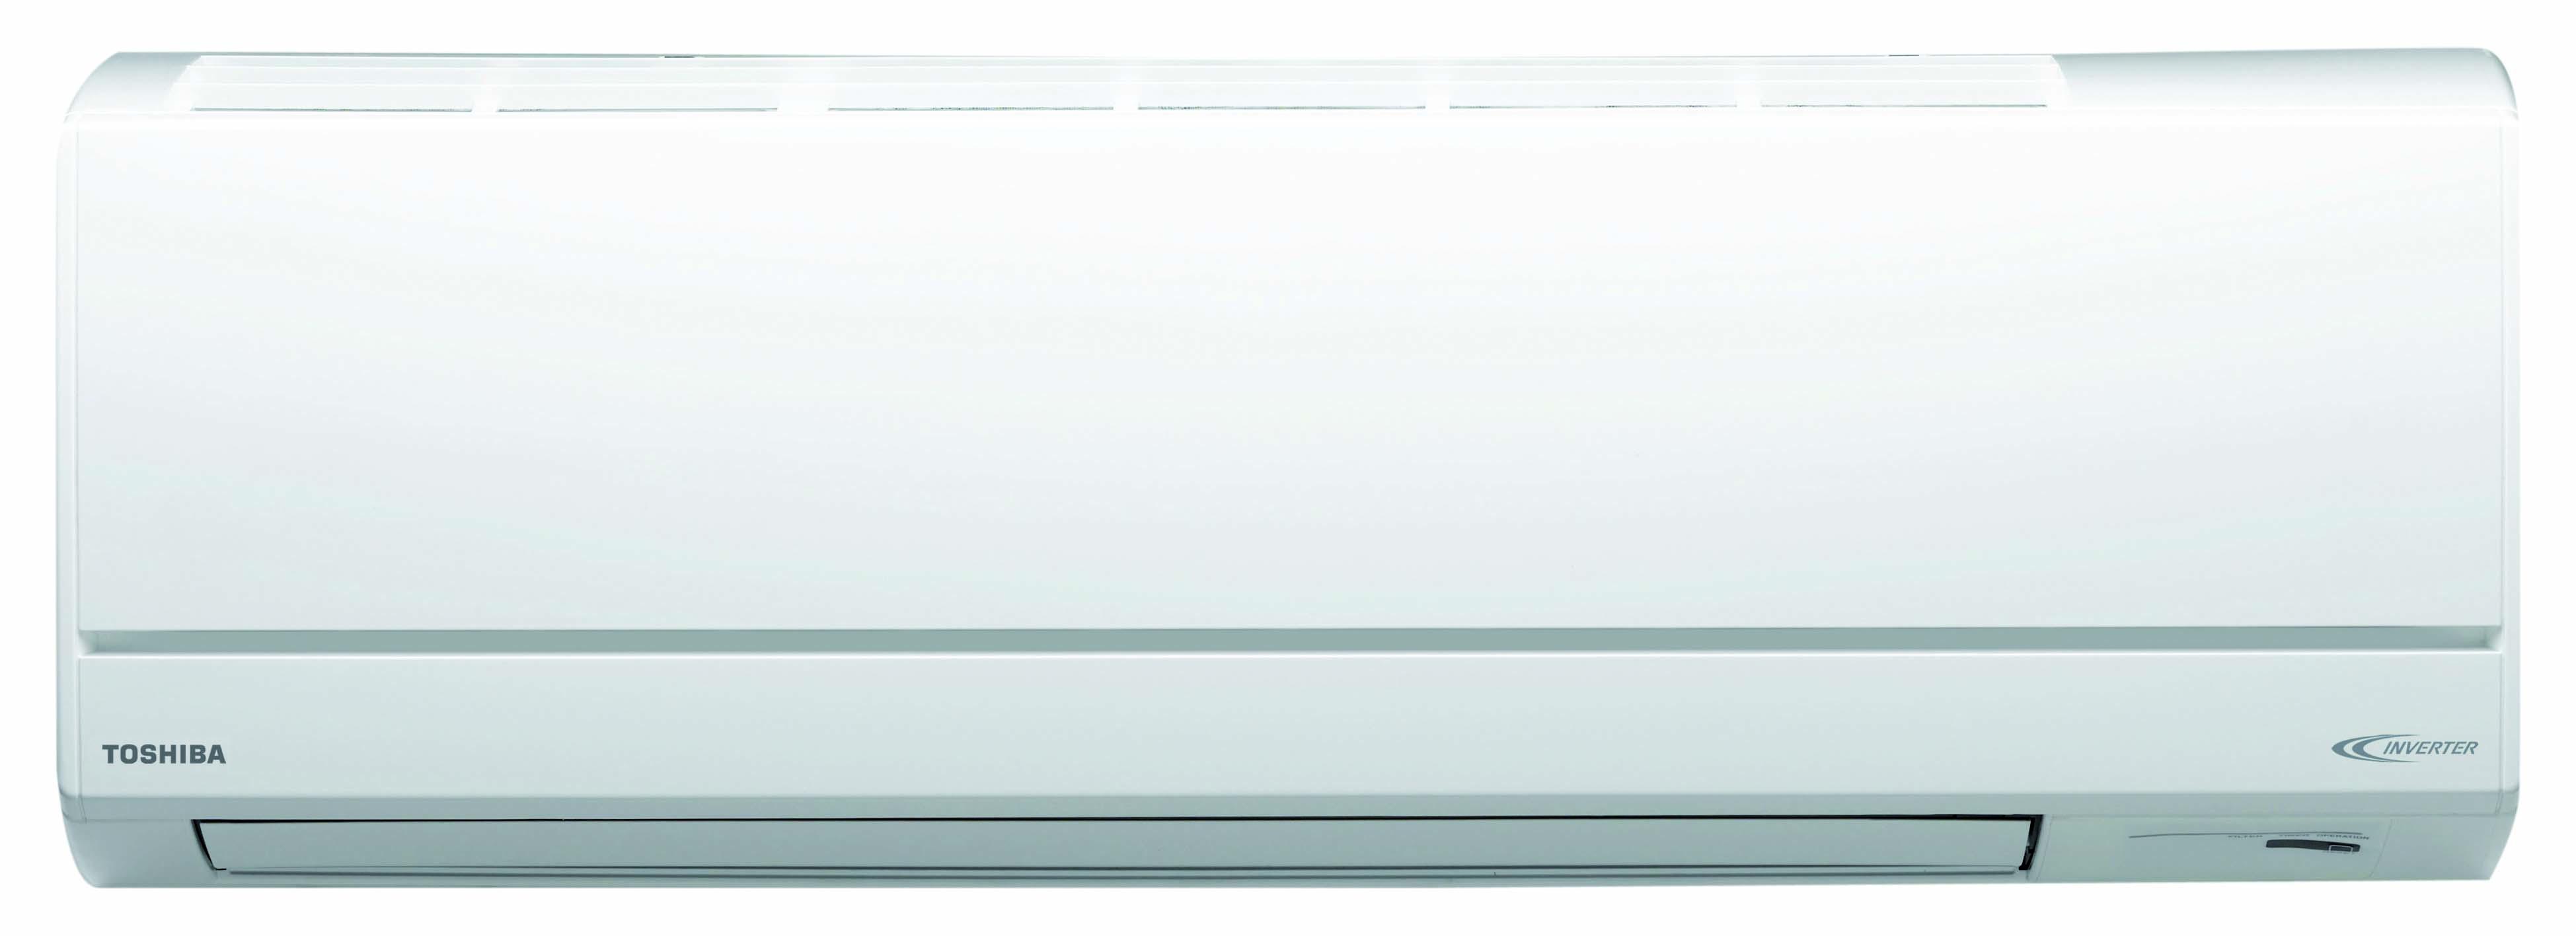 AvAnt inwerter ścienny - model 2013